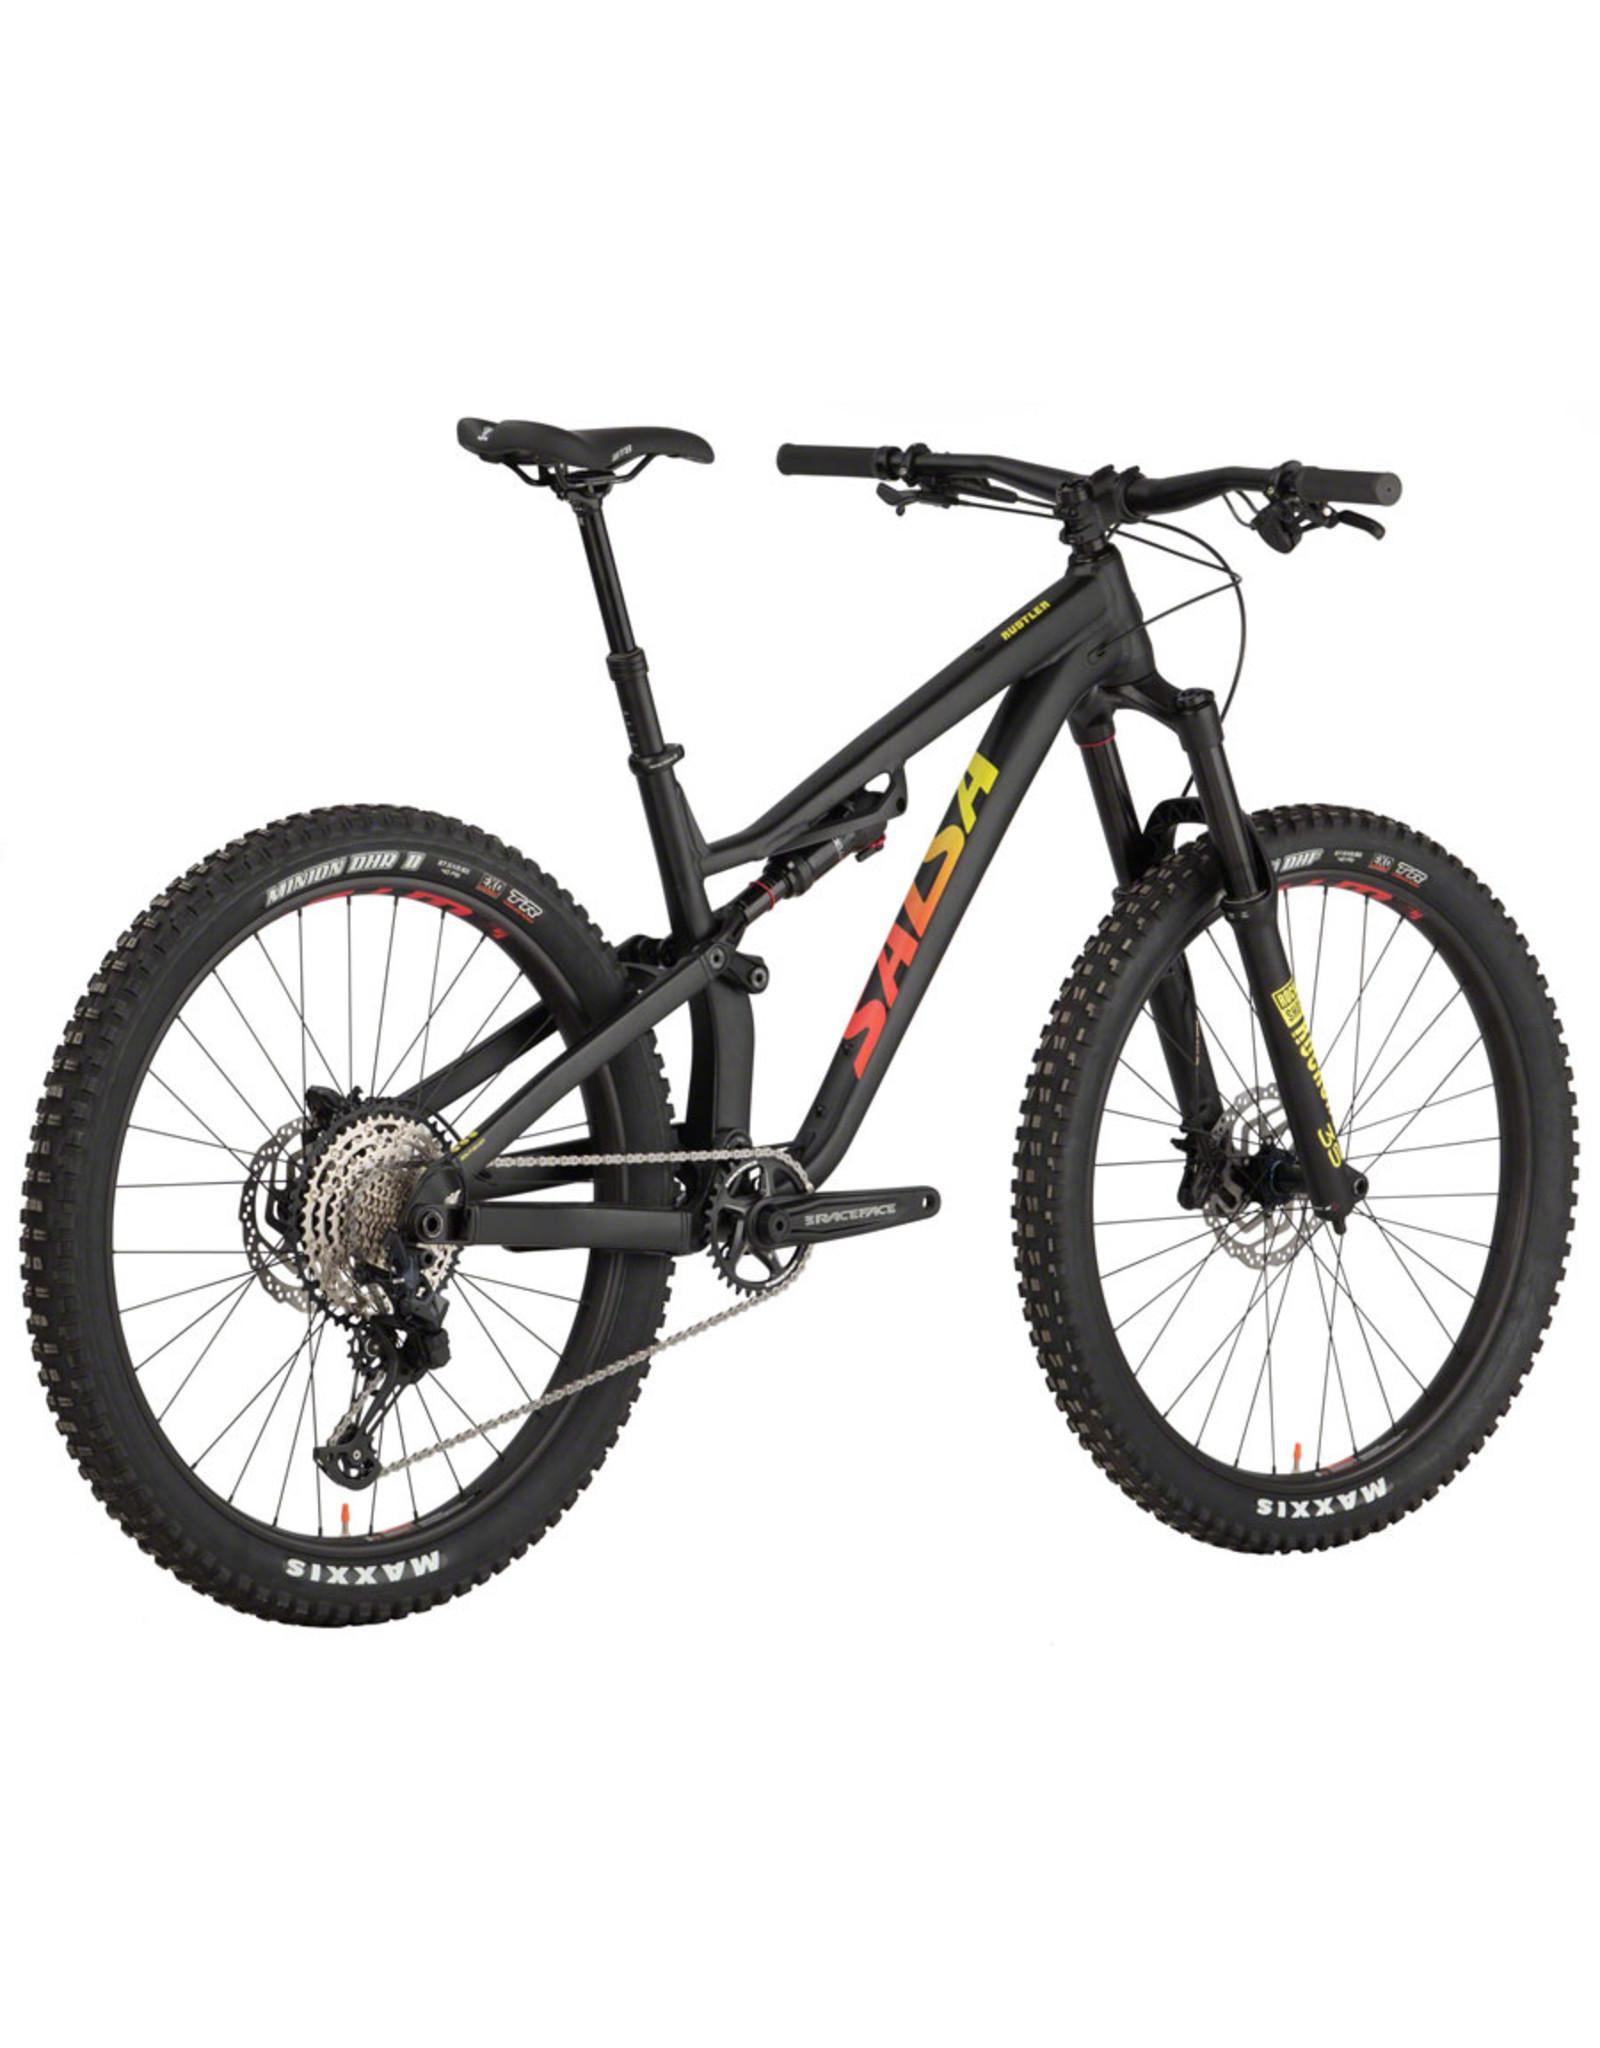 Salsa Salsa Rustler SLX Bike - 27.5, Aluminum, Black